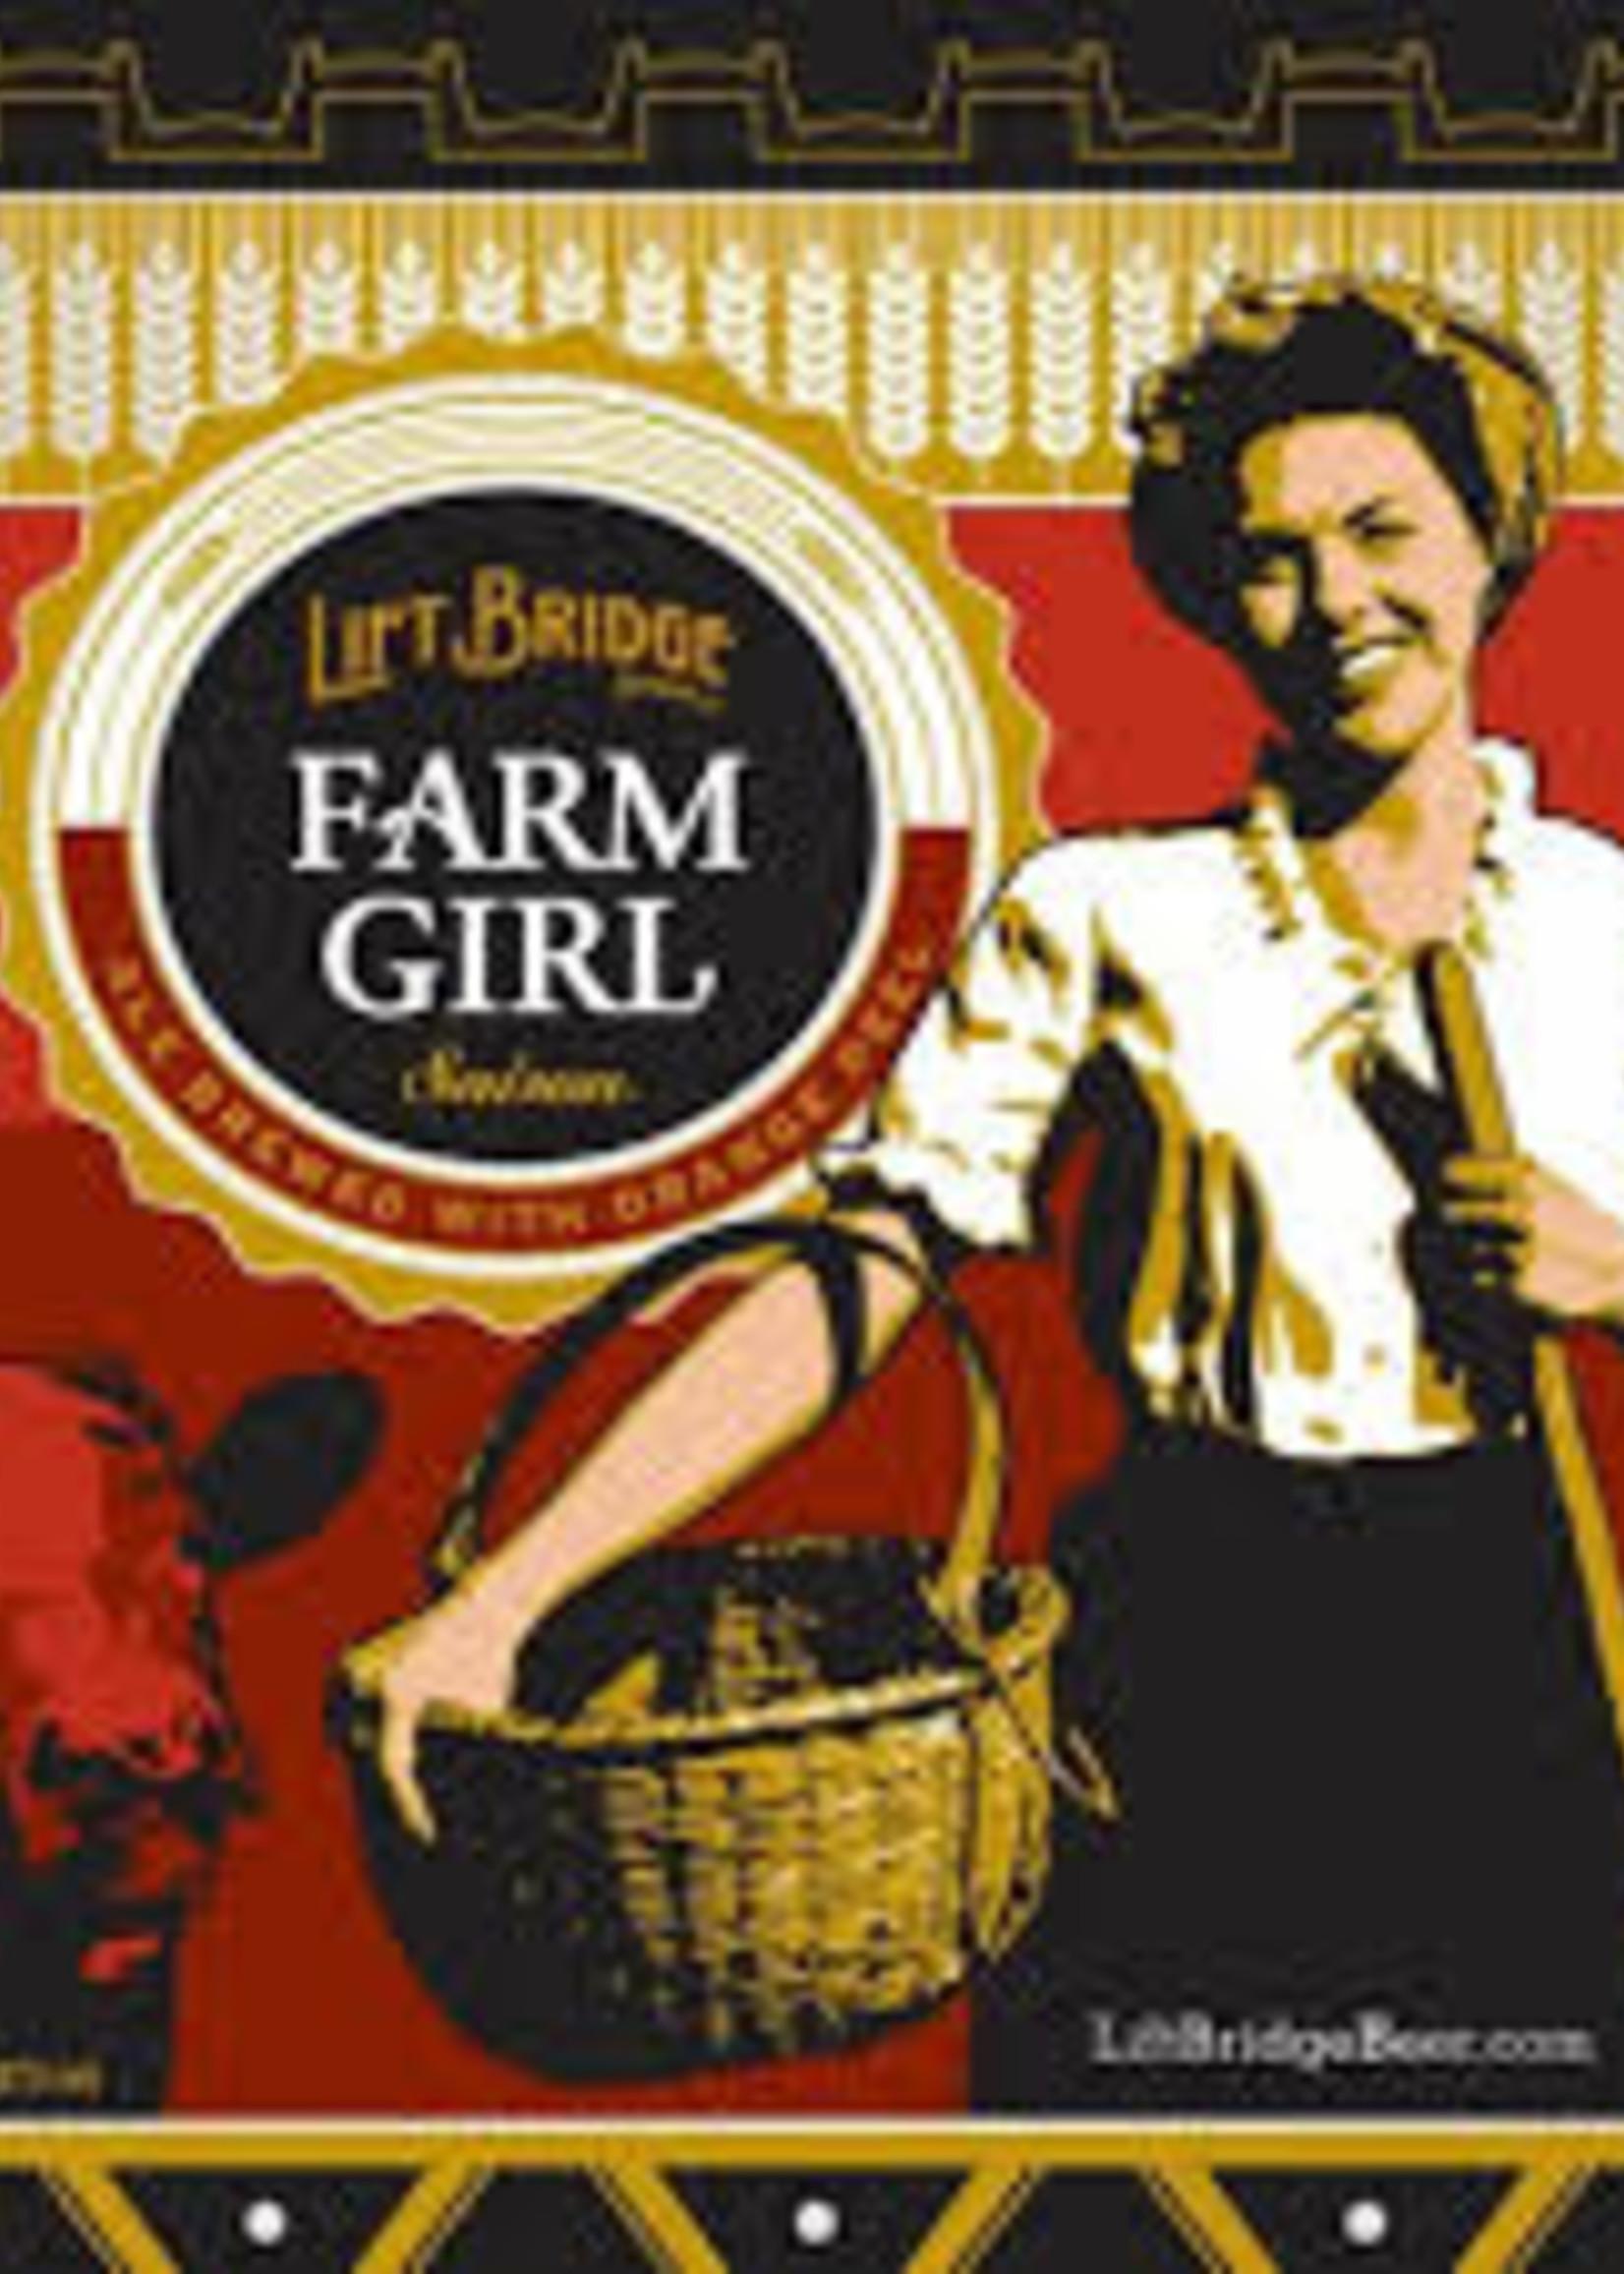 Lift Bridge Farm Girl 6x12oz Cans